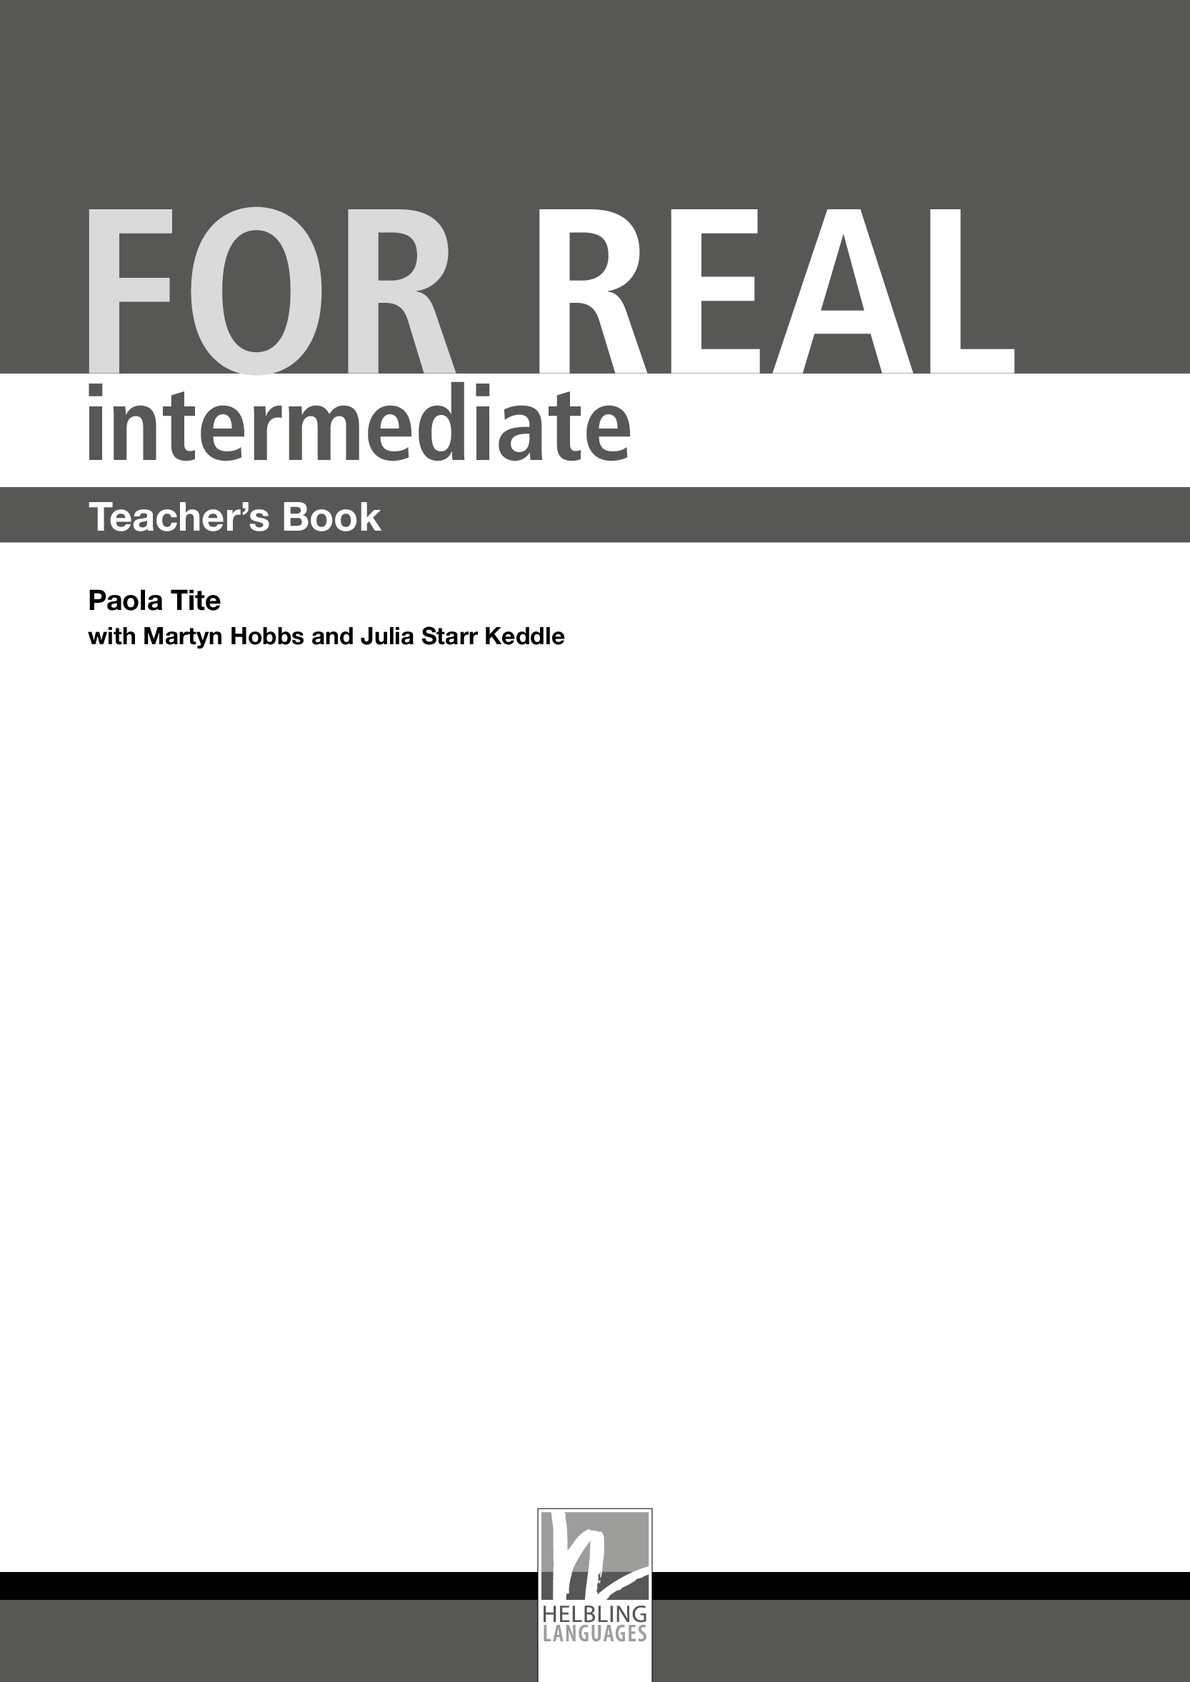 Calamo teacher books intermediate for real fandeluxe Choice Image